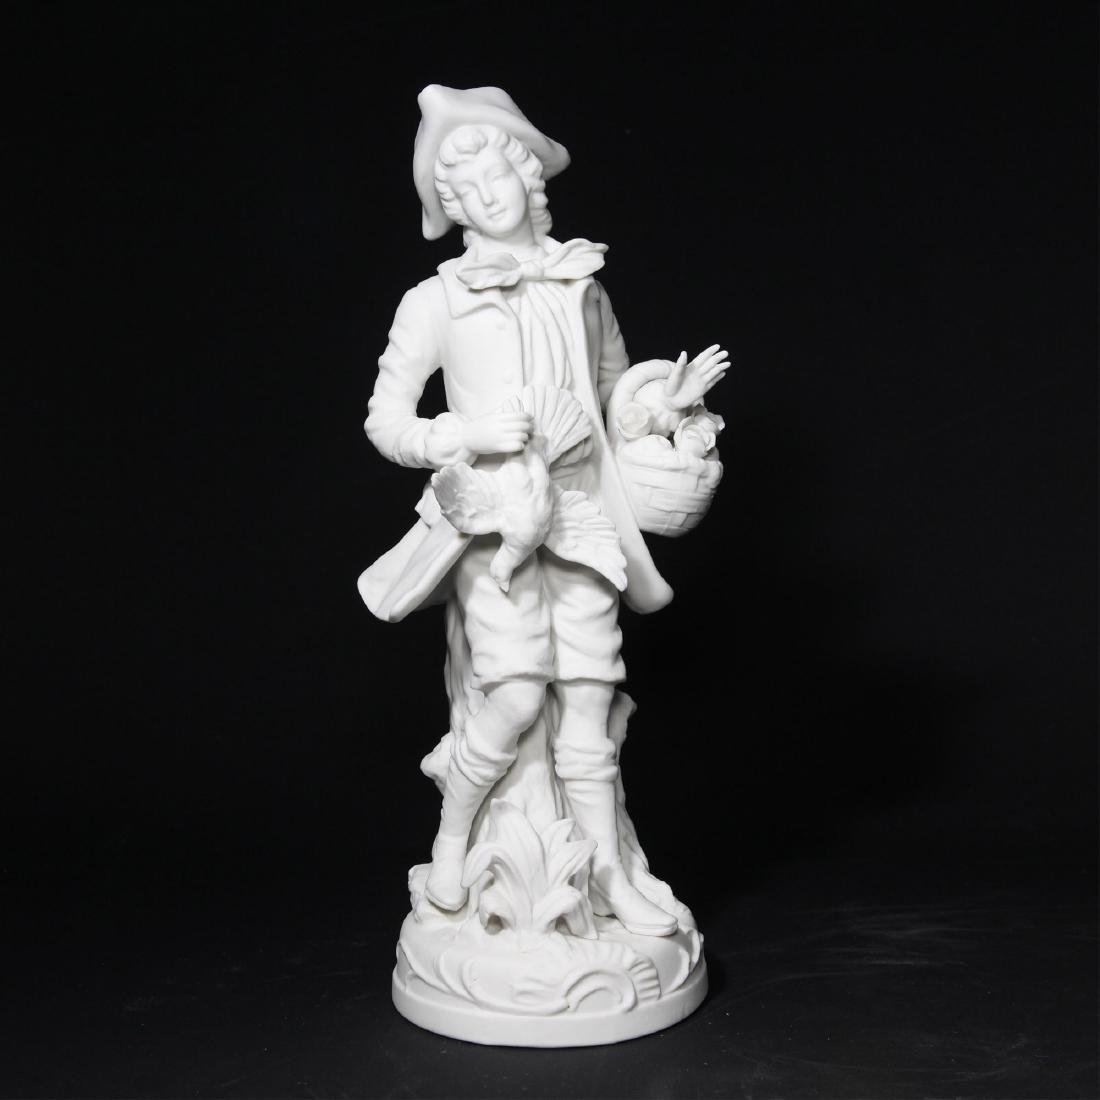 Bisque Porcelain Statue Sculptural Figurine